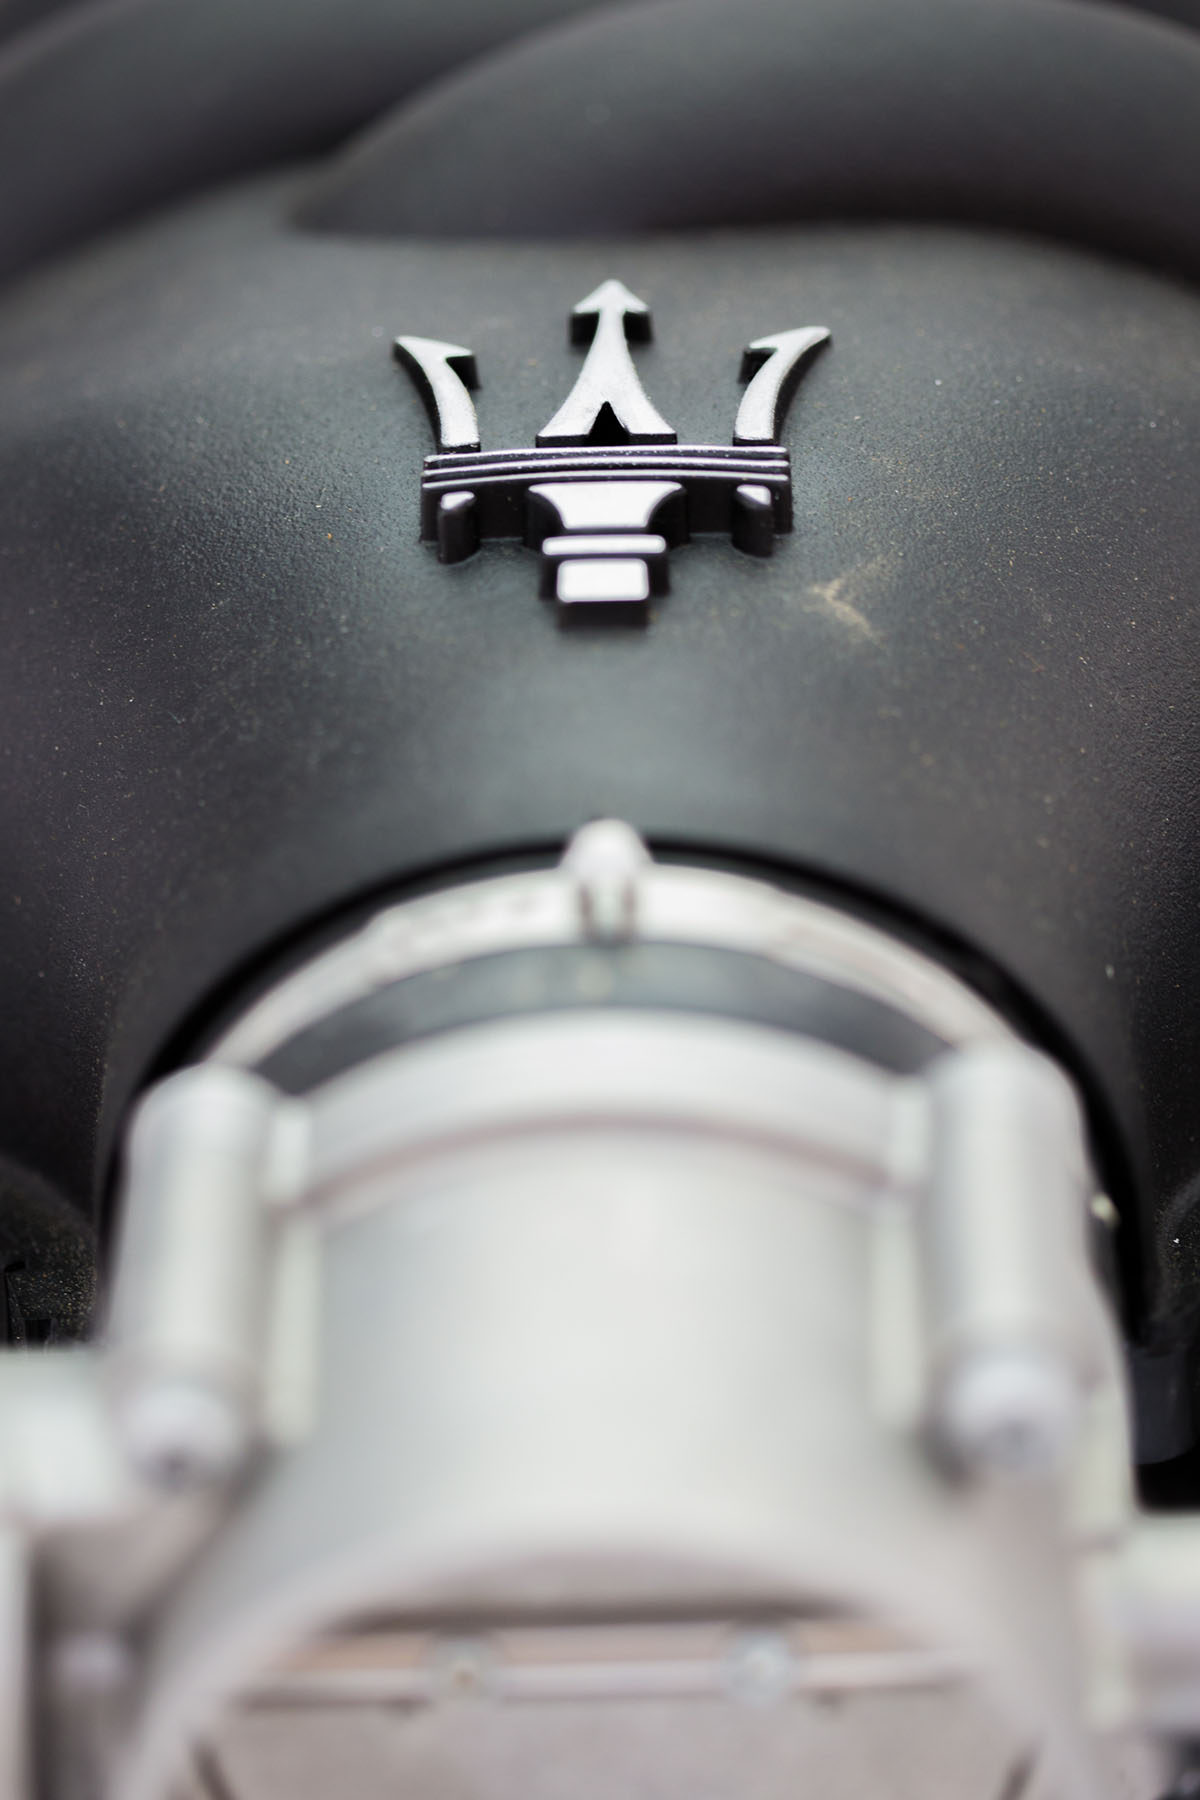 Maserati engine on display at Art Dubai by Loesje Kessels Fashion Photographer